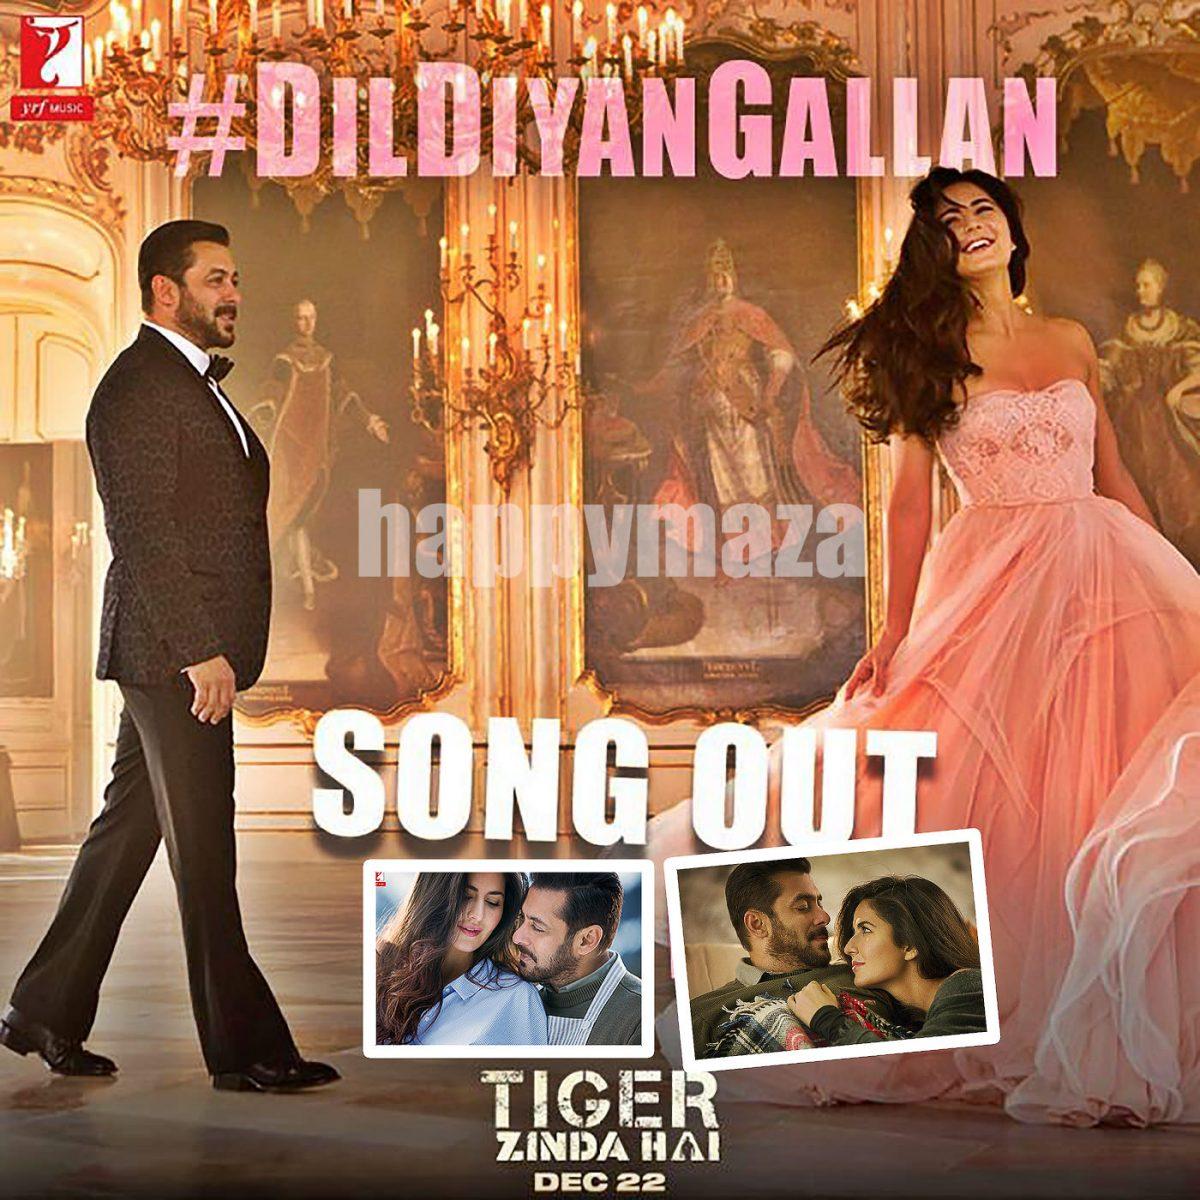 Dil Diyan Gallan Tiger Zinda Hai first look out song on Salman Khan Bigg Boss 11